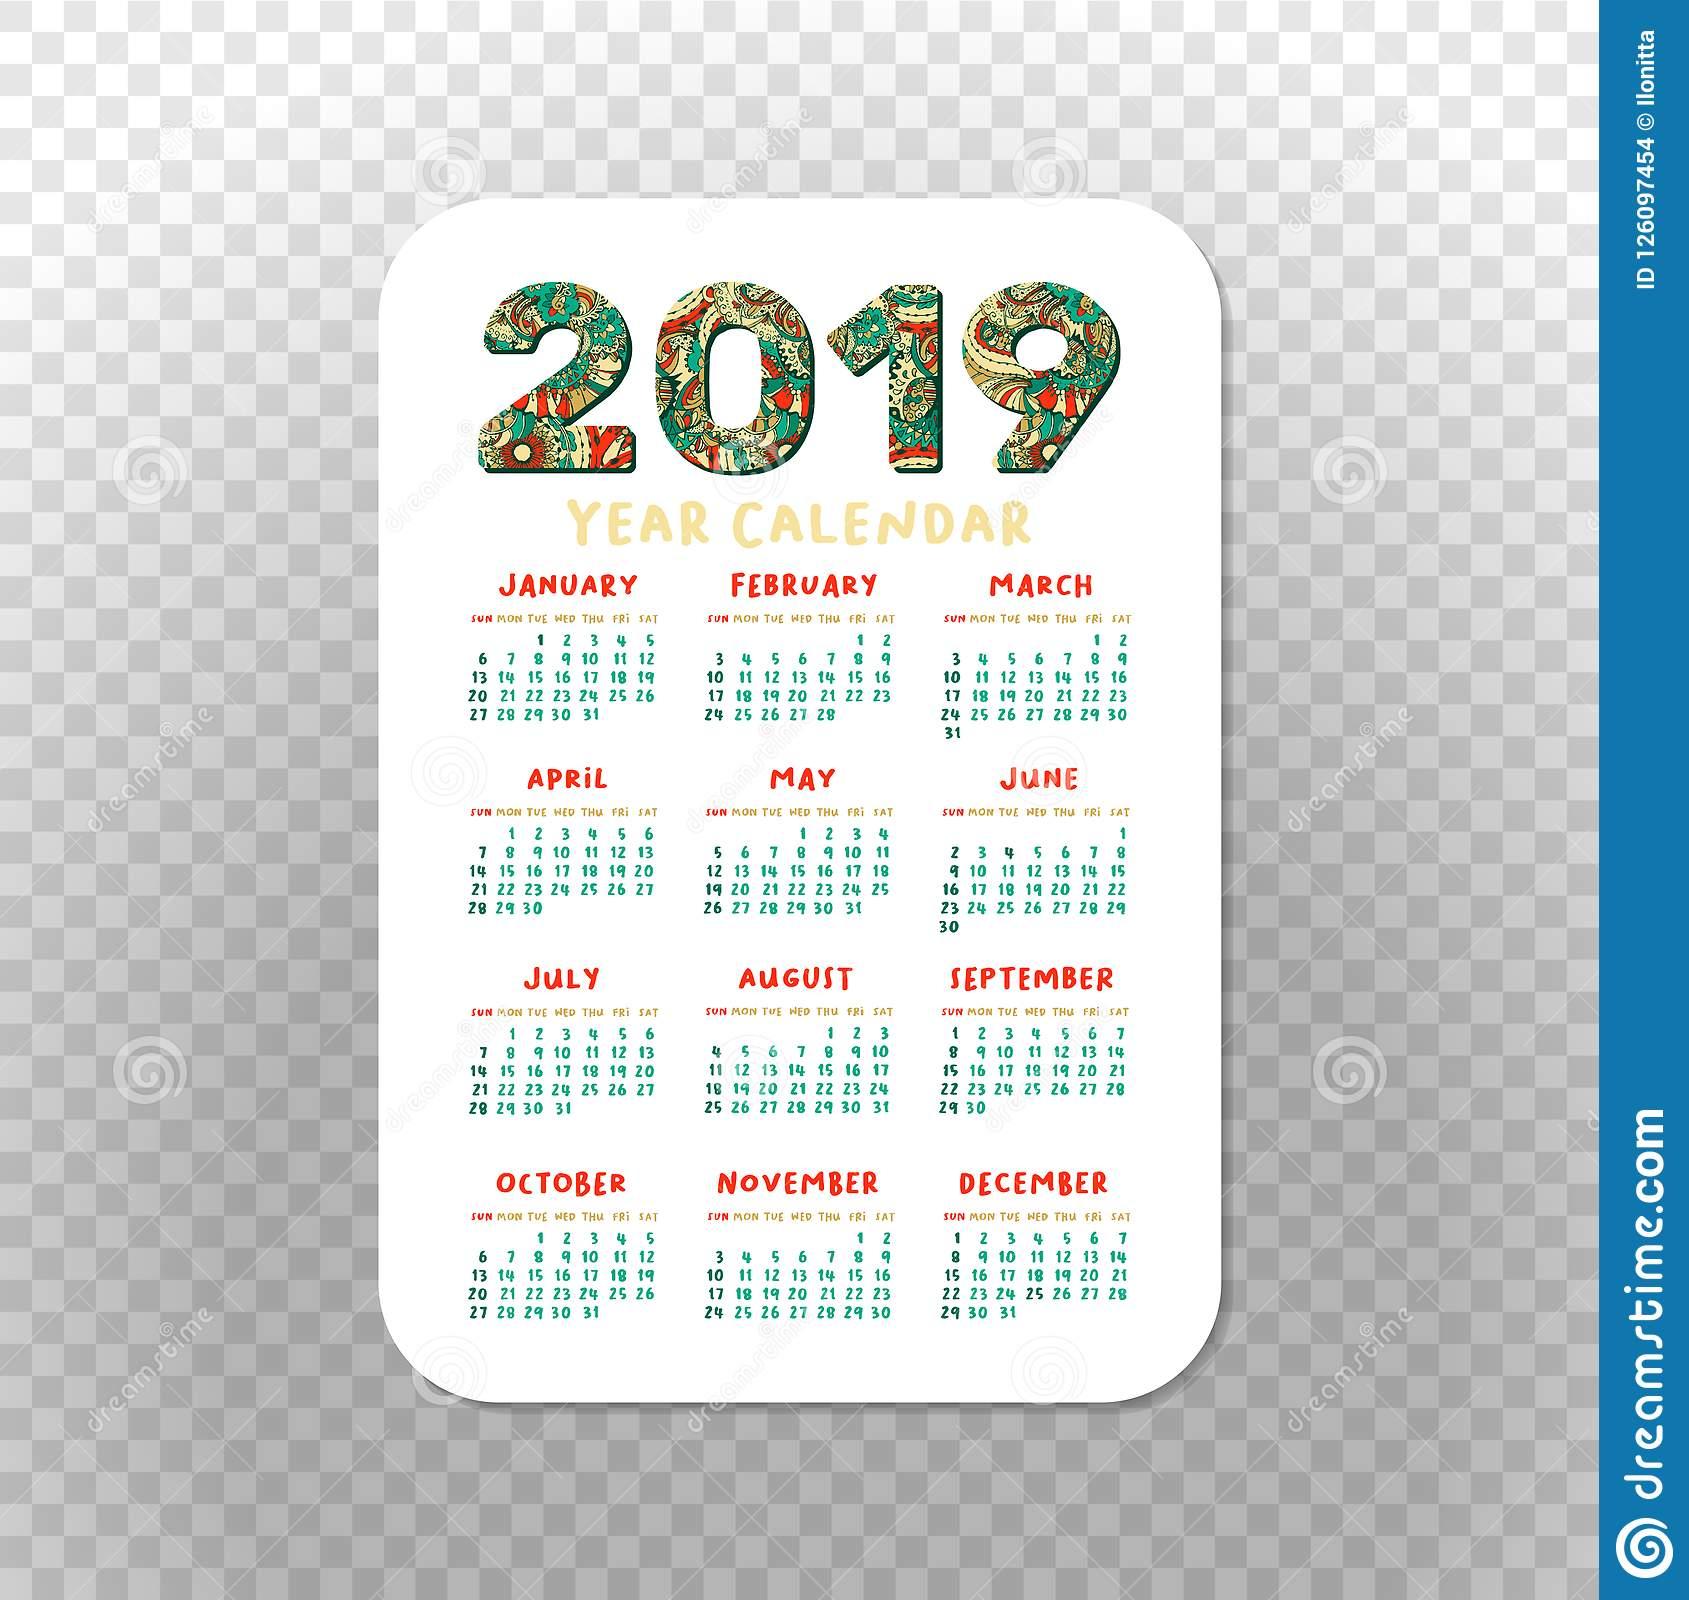 2019 Calendar Template For Pocket Calendar, Basic Grid throughout Printable 2020 Wallet Calendar